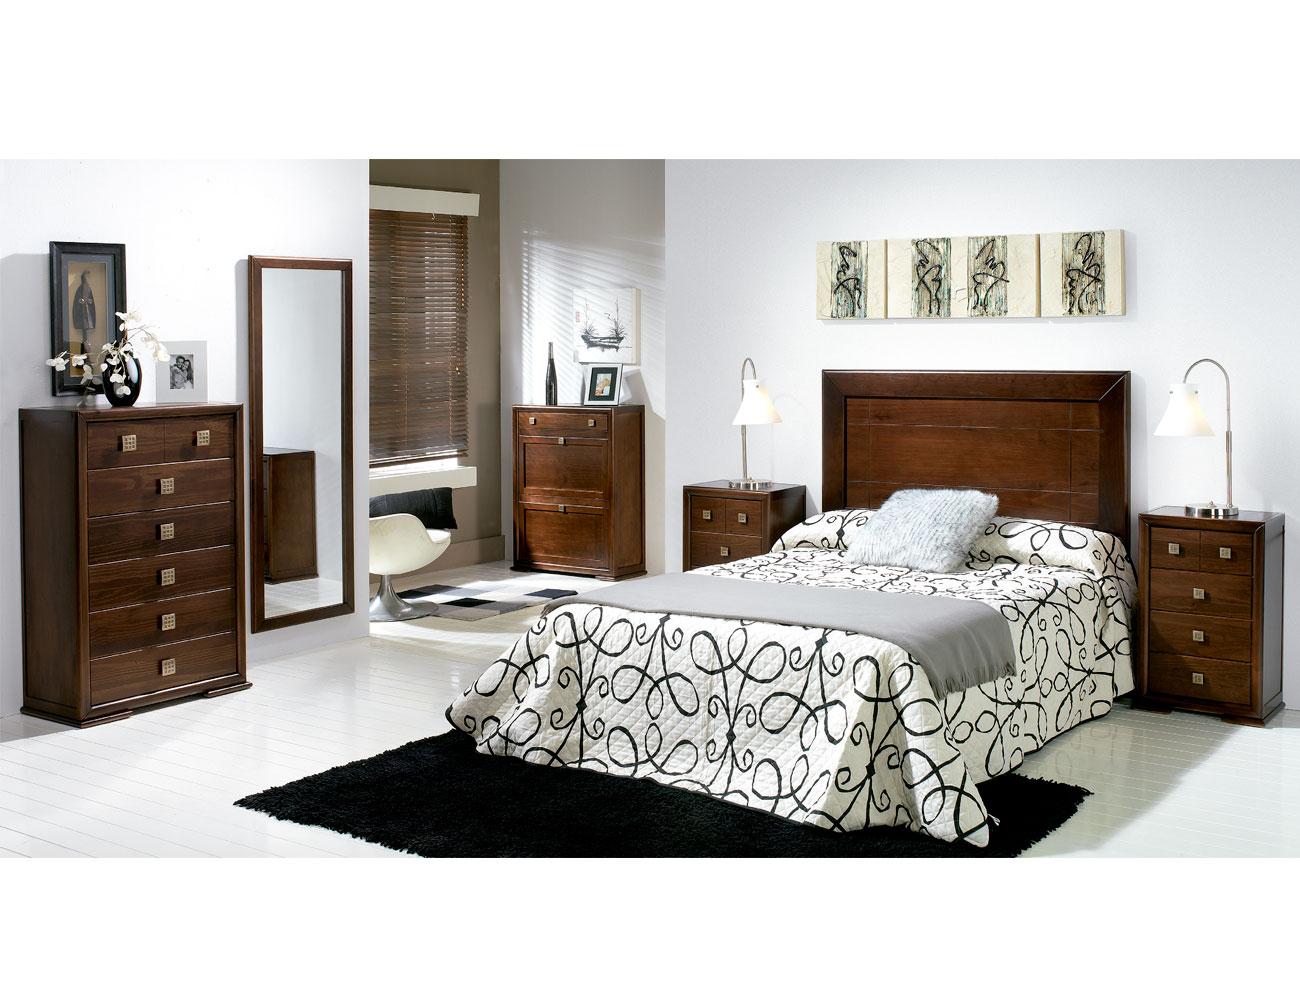 Composicion07 dormitorio matrimonio sinfonier madera sevilla3